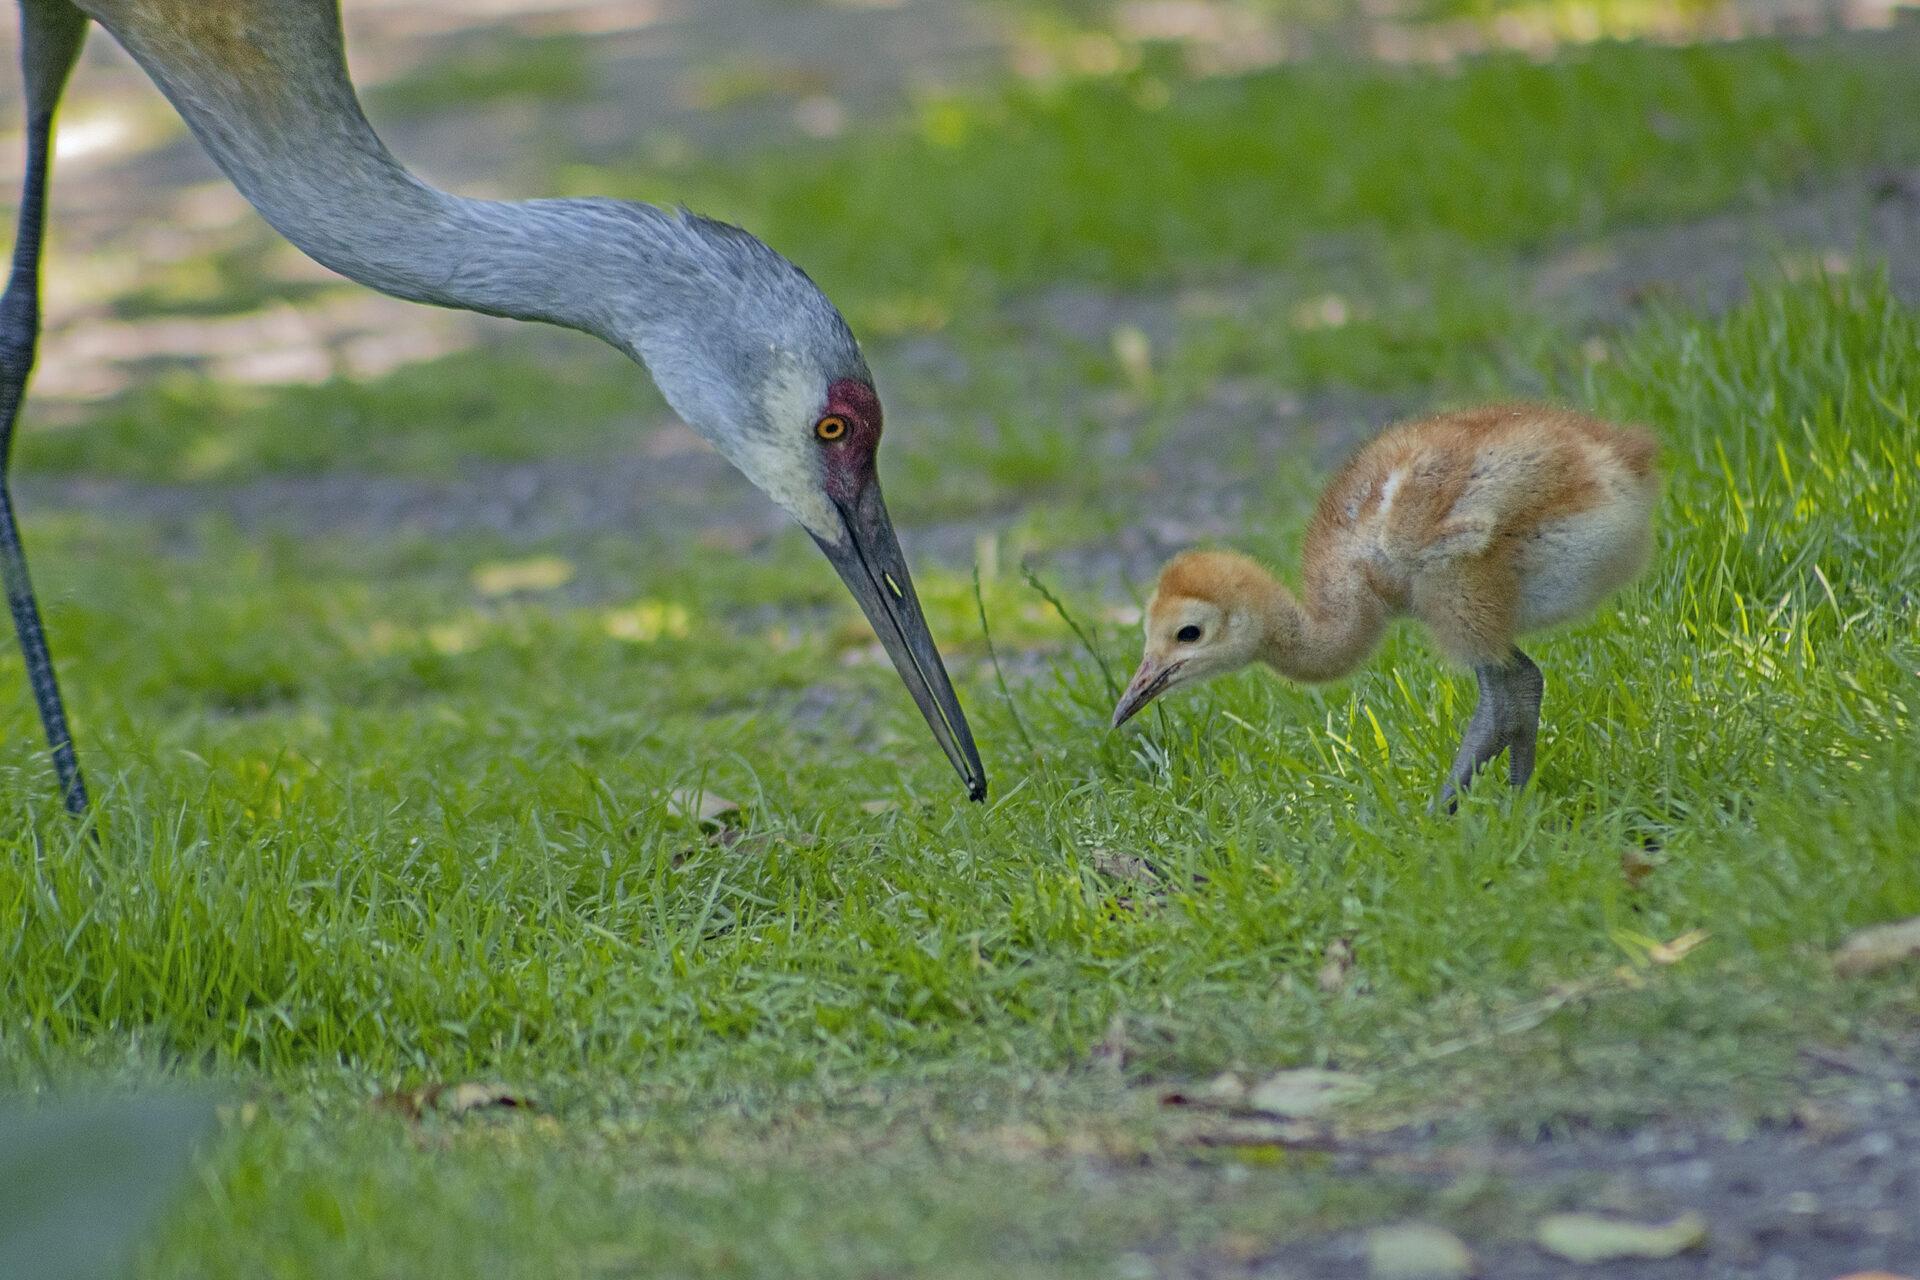 Sandhill Crane and Colt, Reifel Bird Sanctuary, July 2, 2021